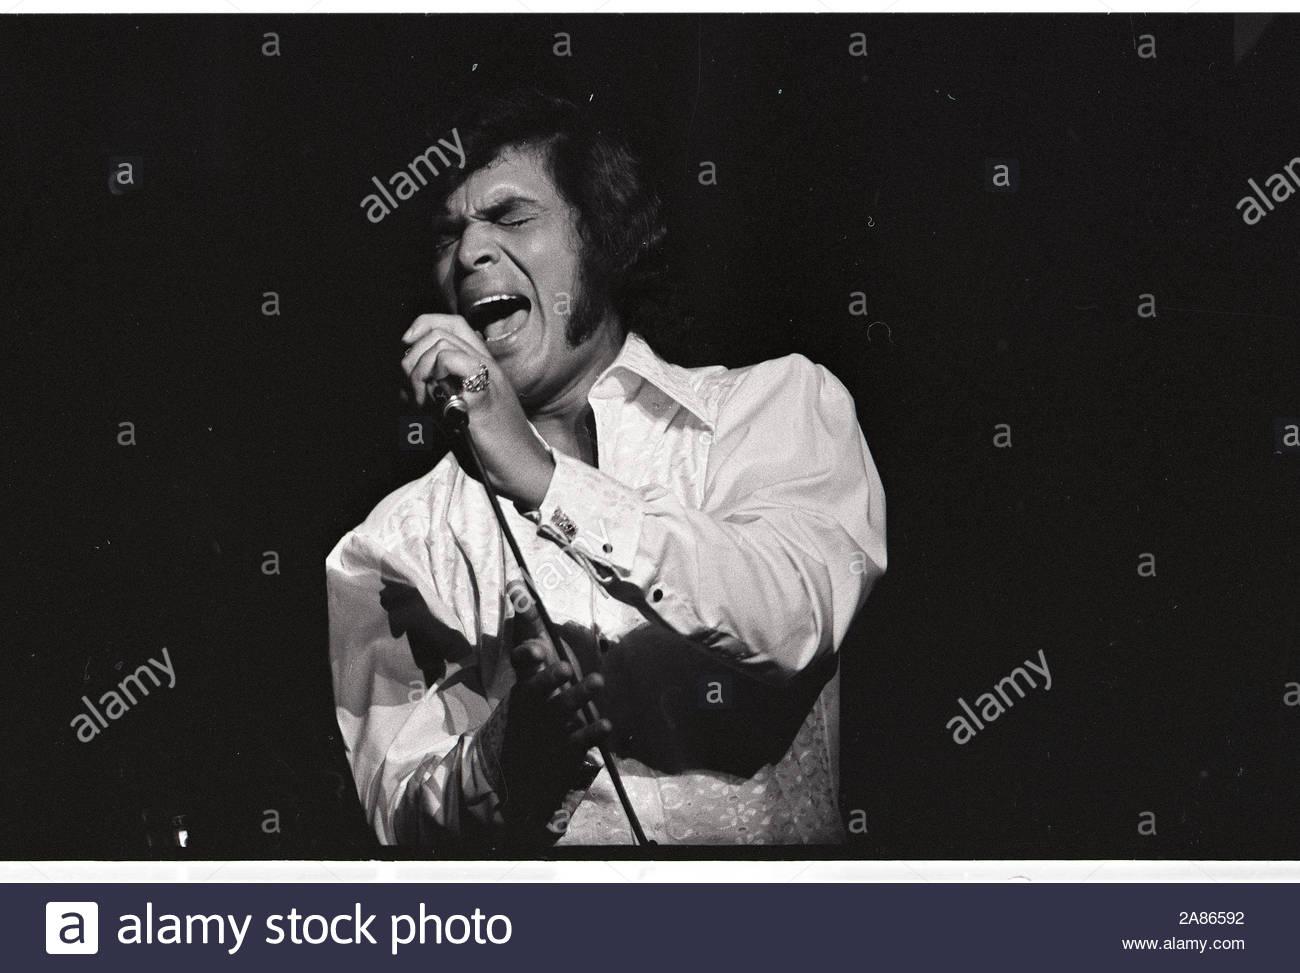 ARIE CROWN THEATER Photo 022 Opening Night 1971 Singer ENGELBERT HUMPERDINCK